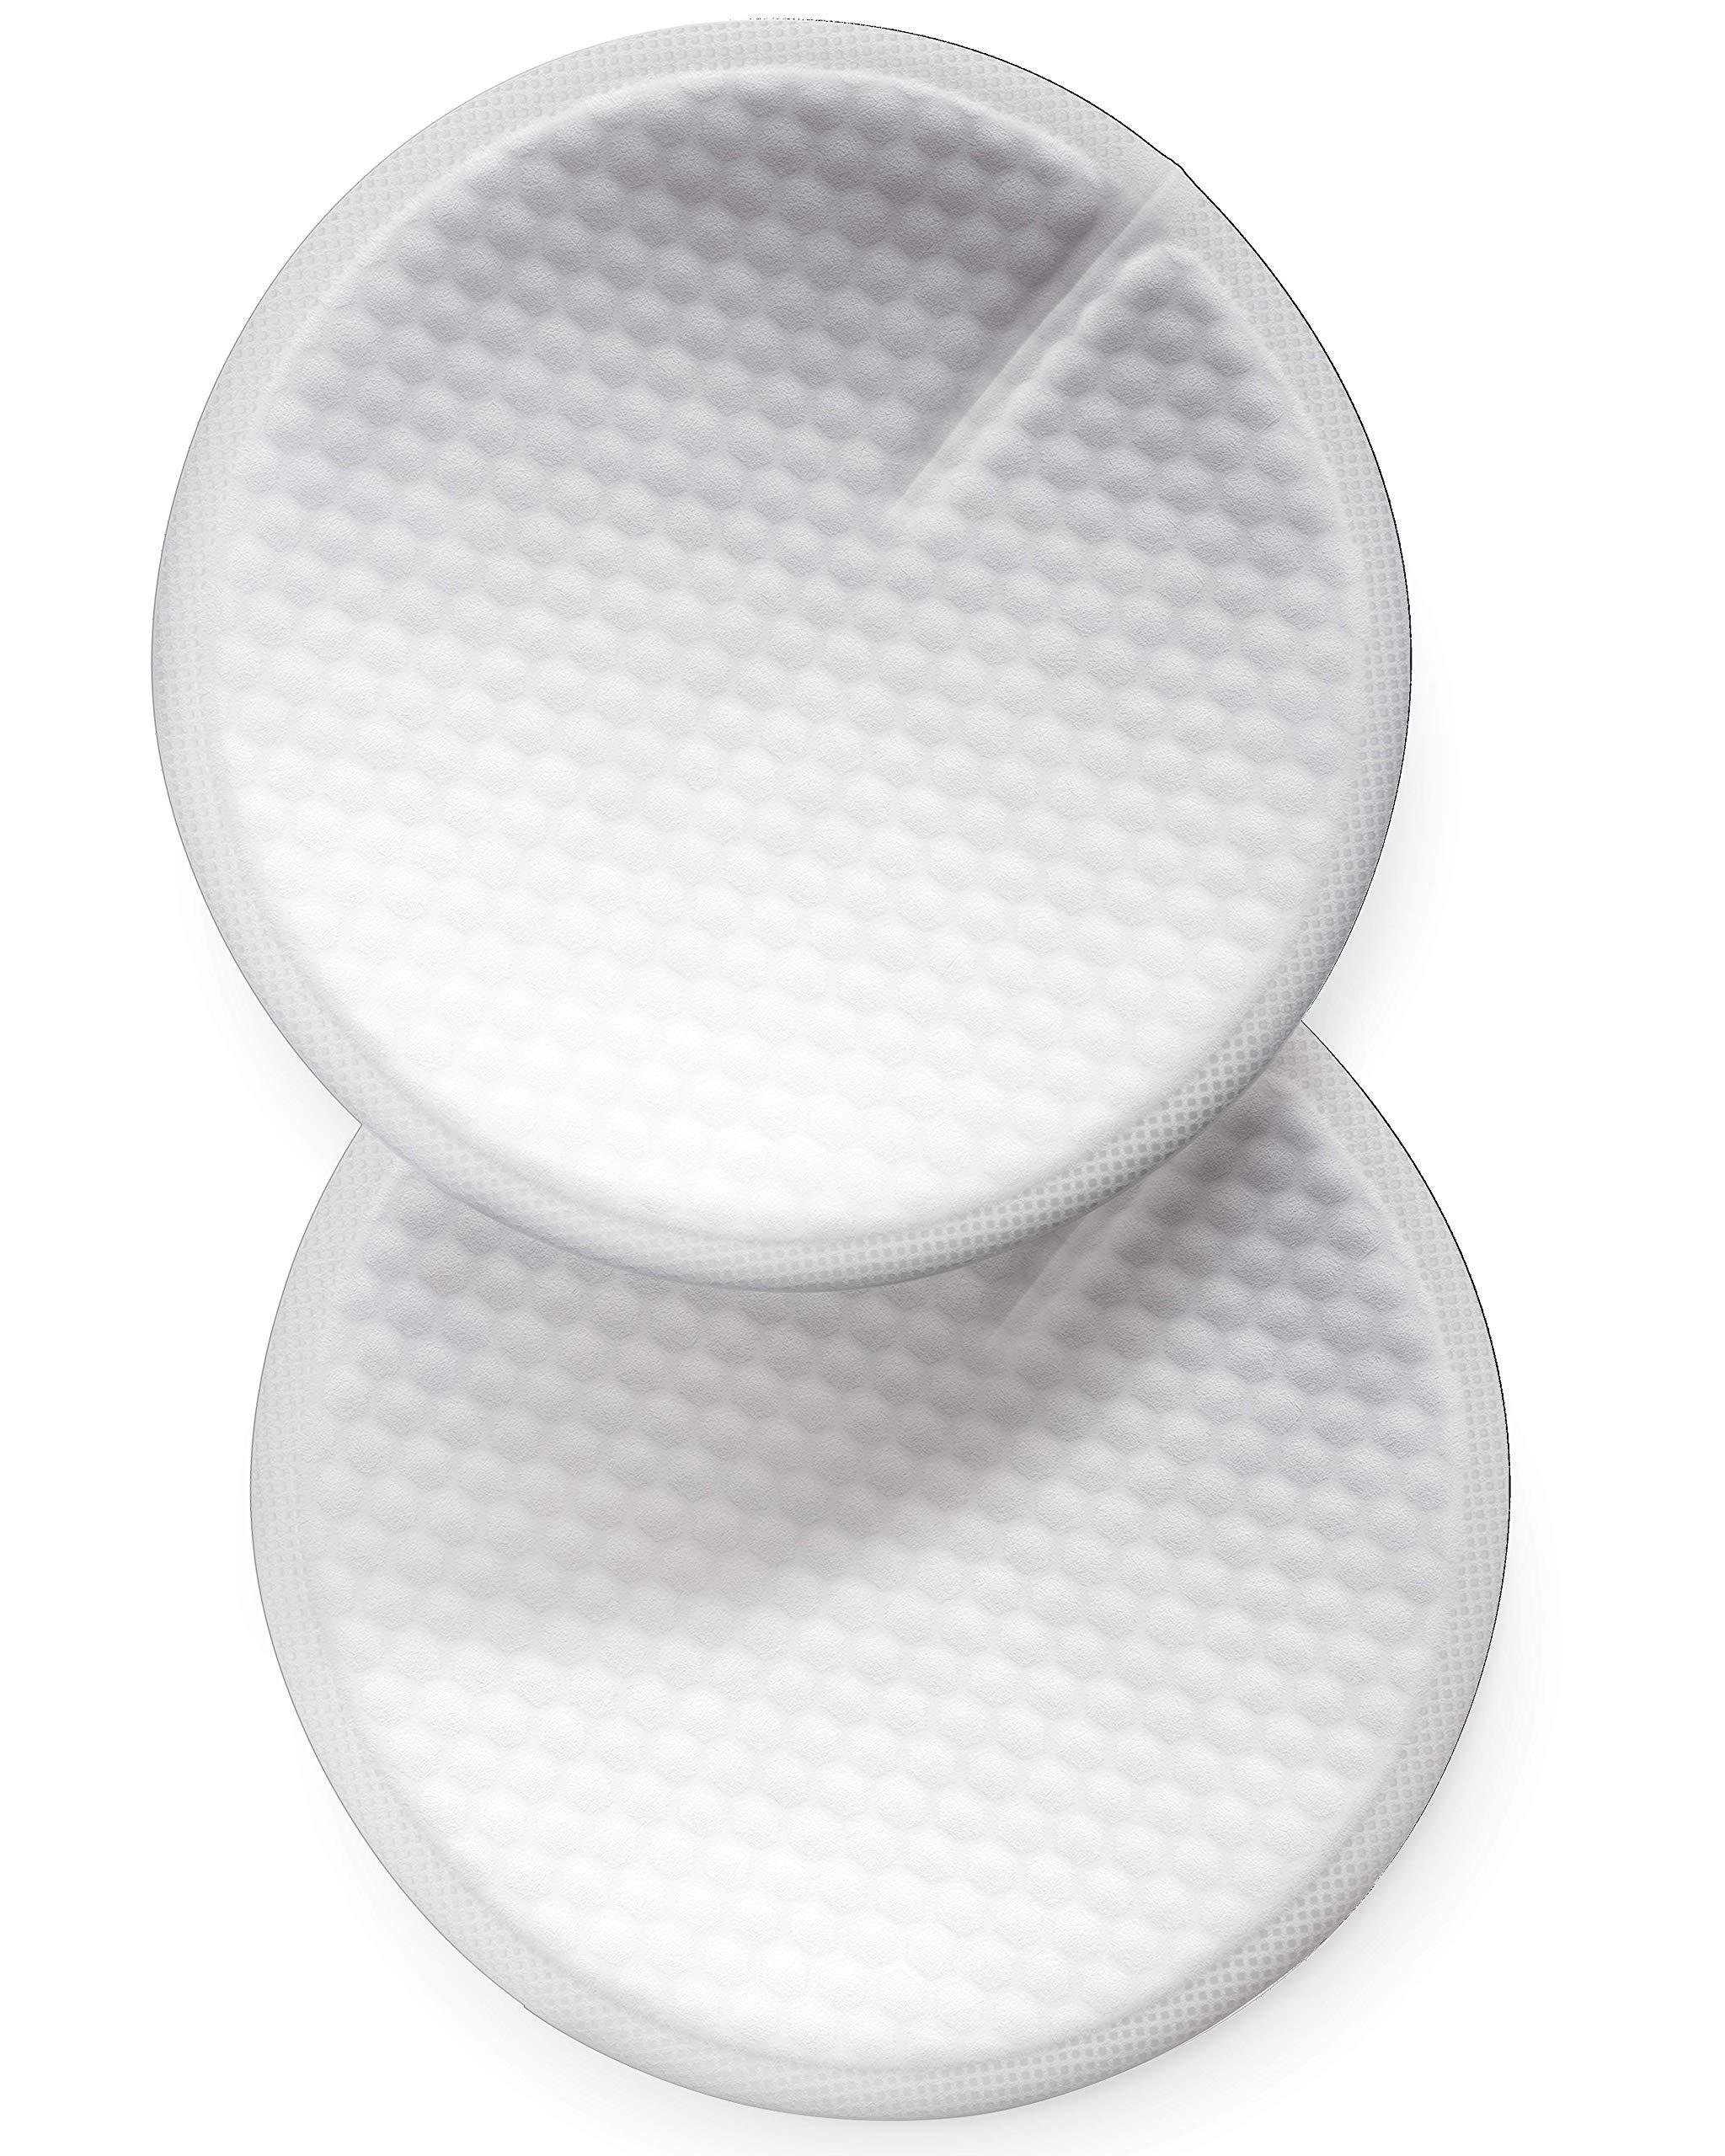 Philips AVENT Maximum Comfort Disposable Breast Pads, 100ct, SCF254/13, White